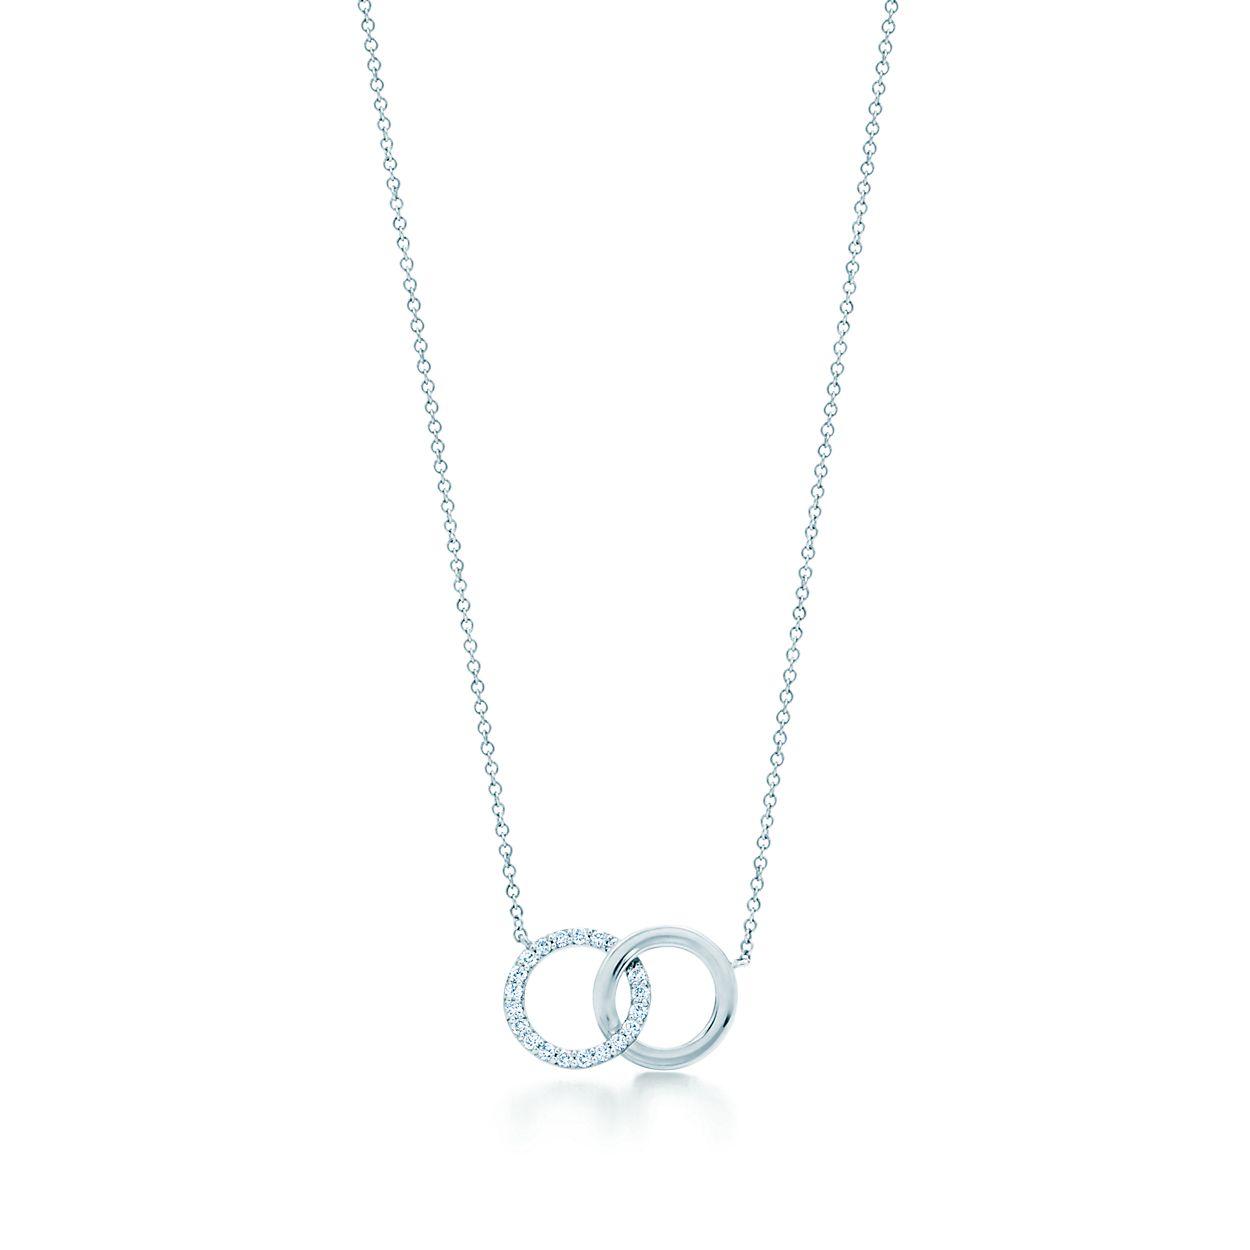 Tiffany 1837 circle pendant in 18k gold with diamonds Tiffany & Co. Syzkn